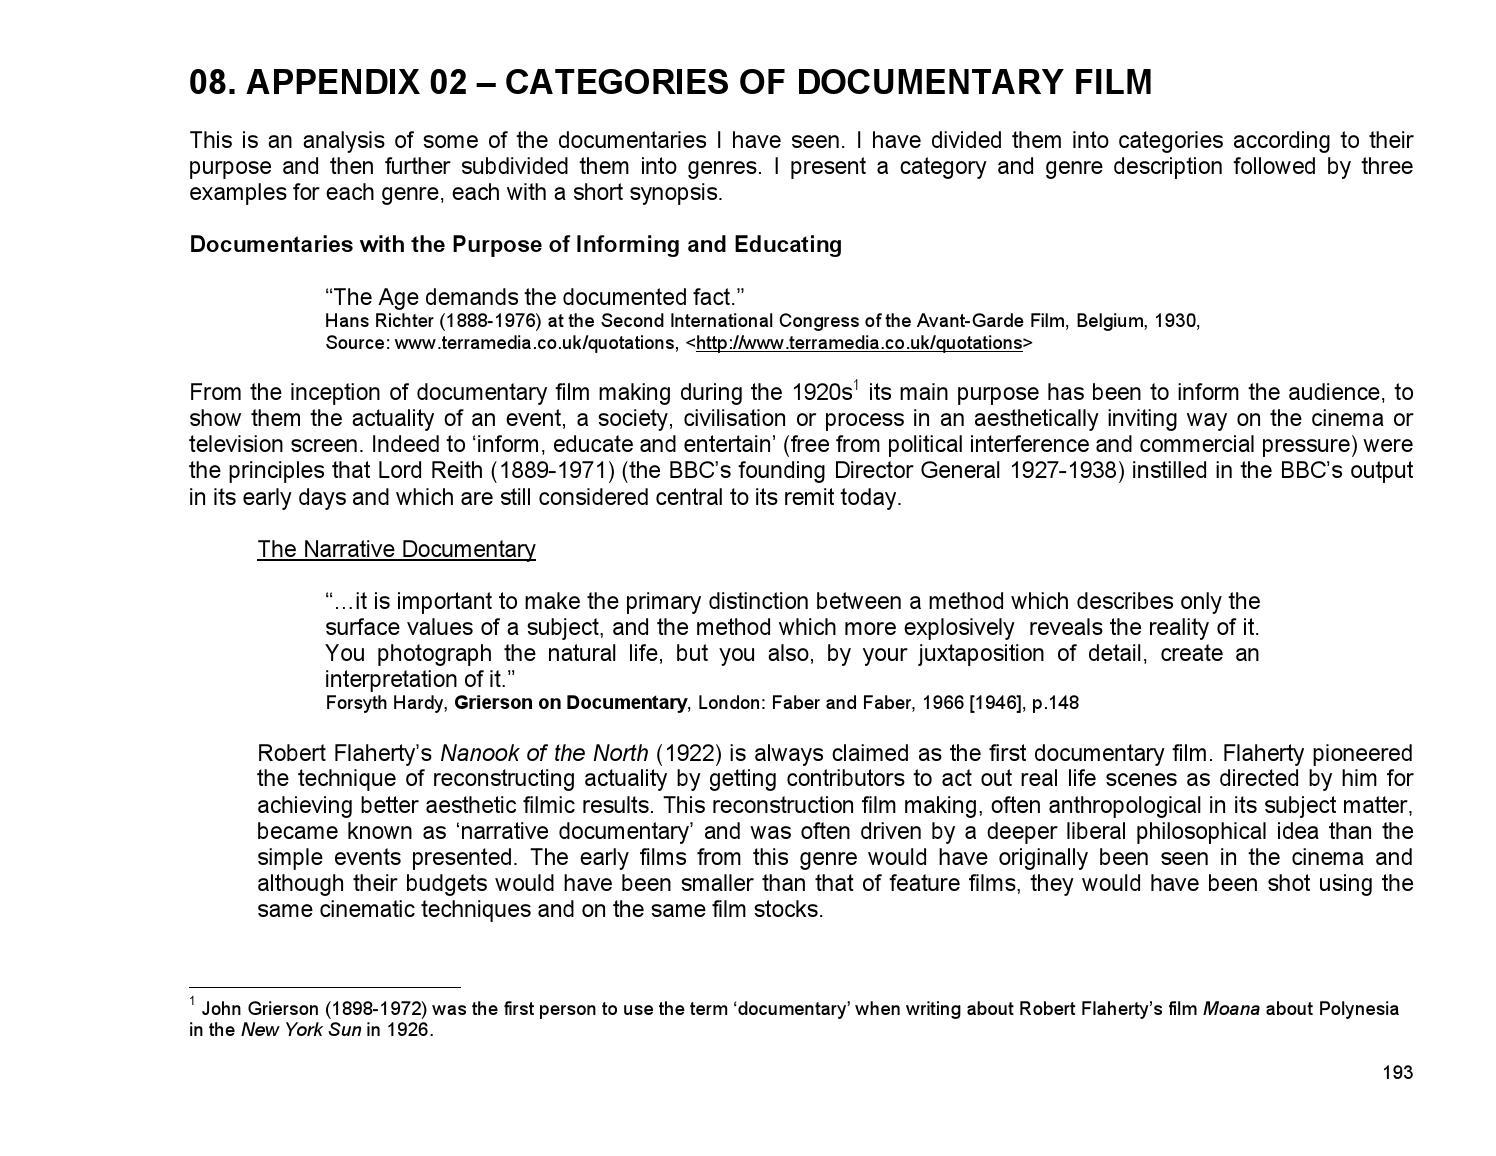 Appendix 02 Cat Doc Film By Adele Carroll Issuu